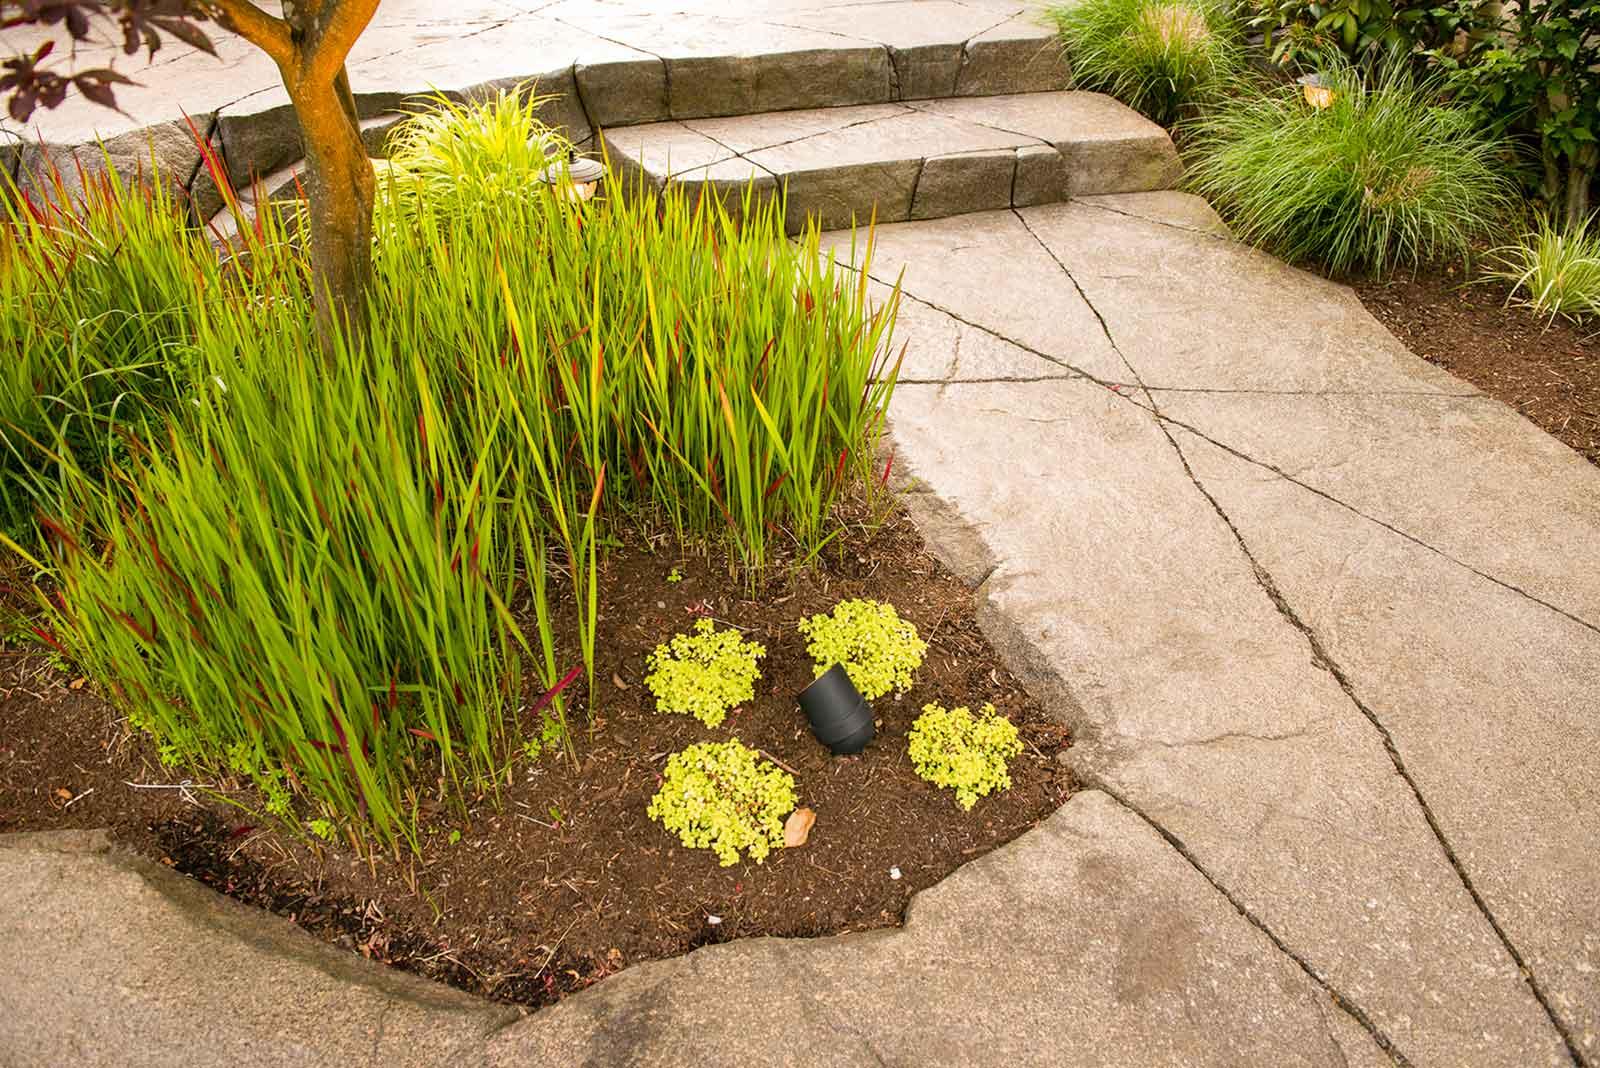 Custom concrete paved path around flower beds